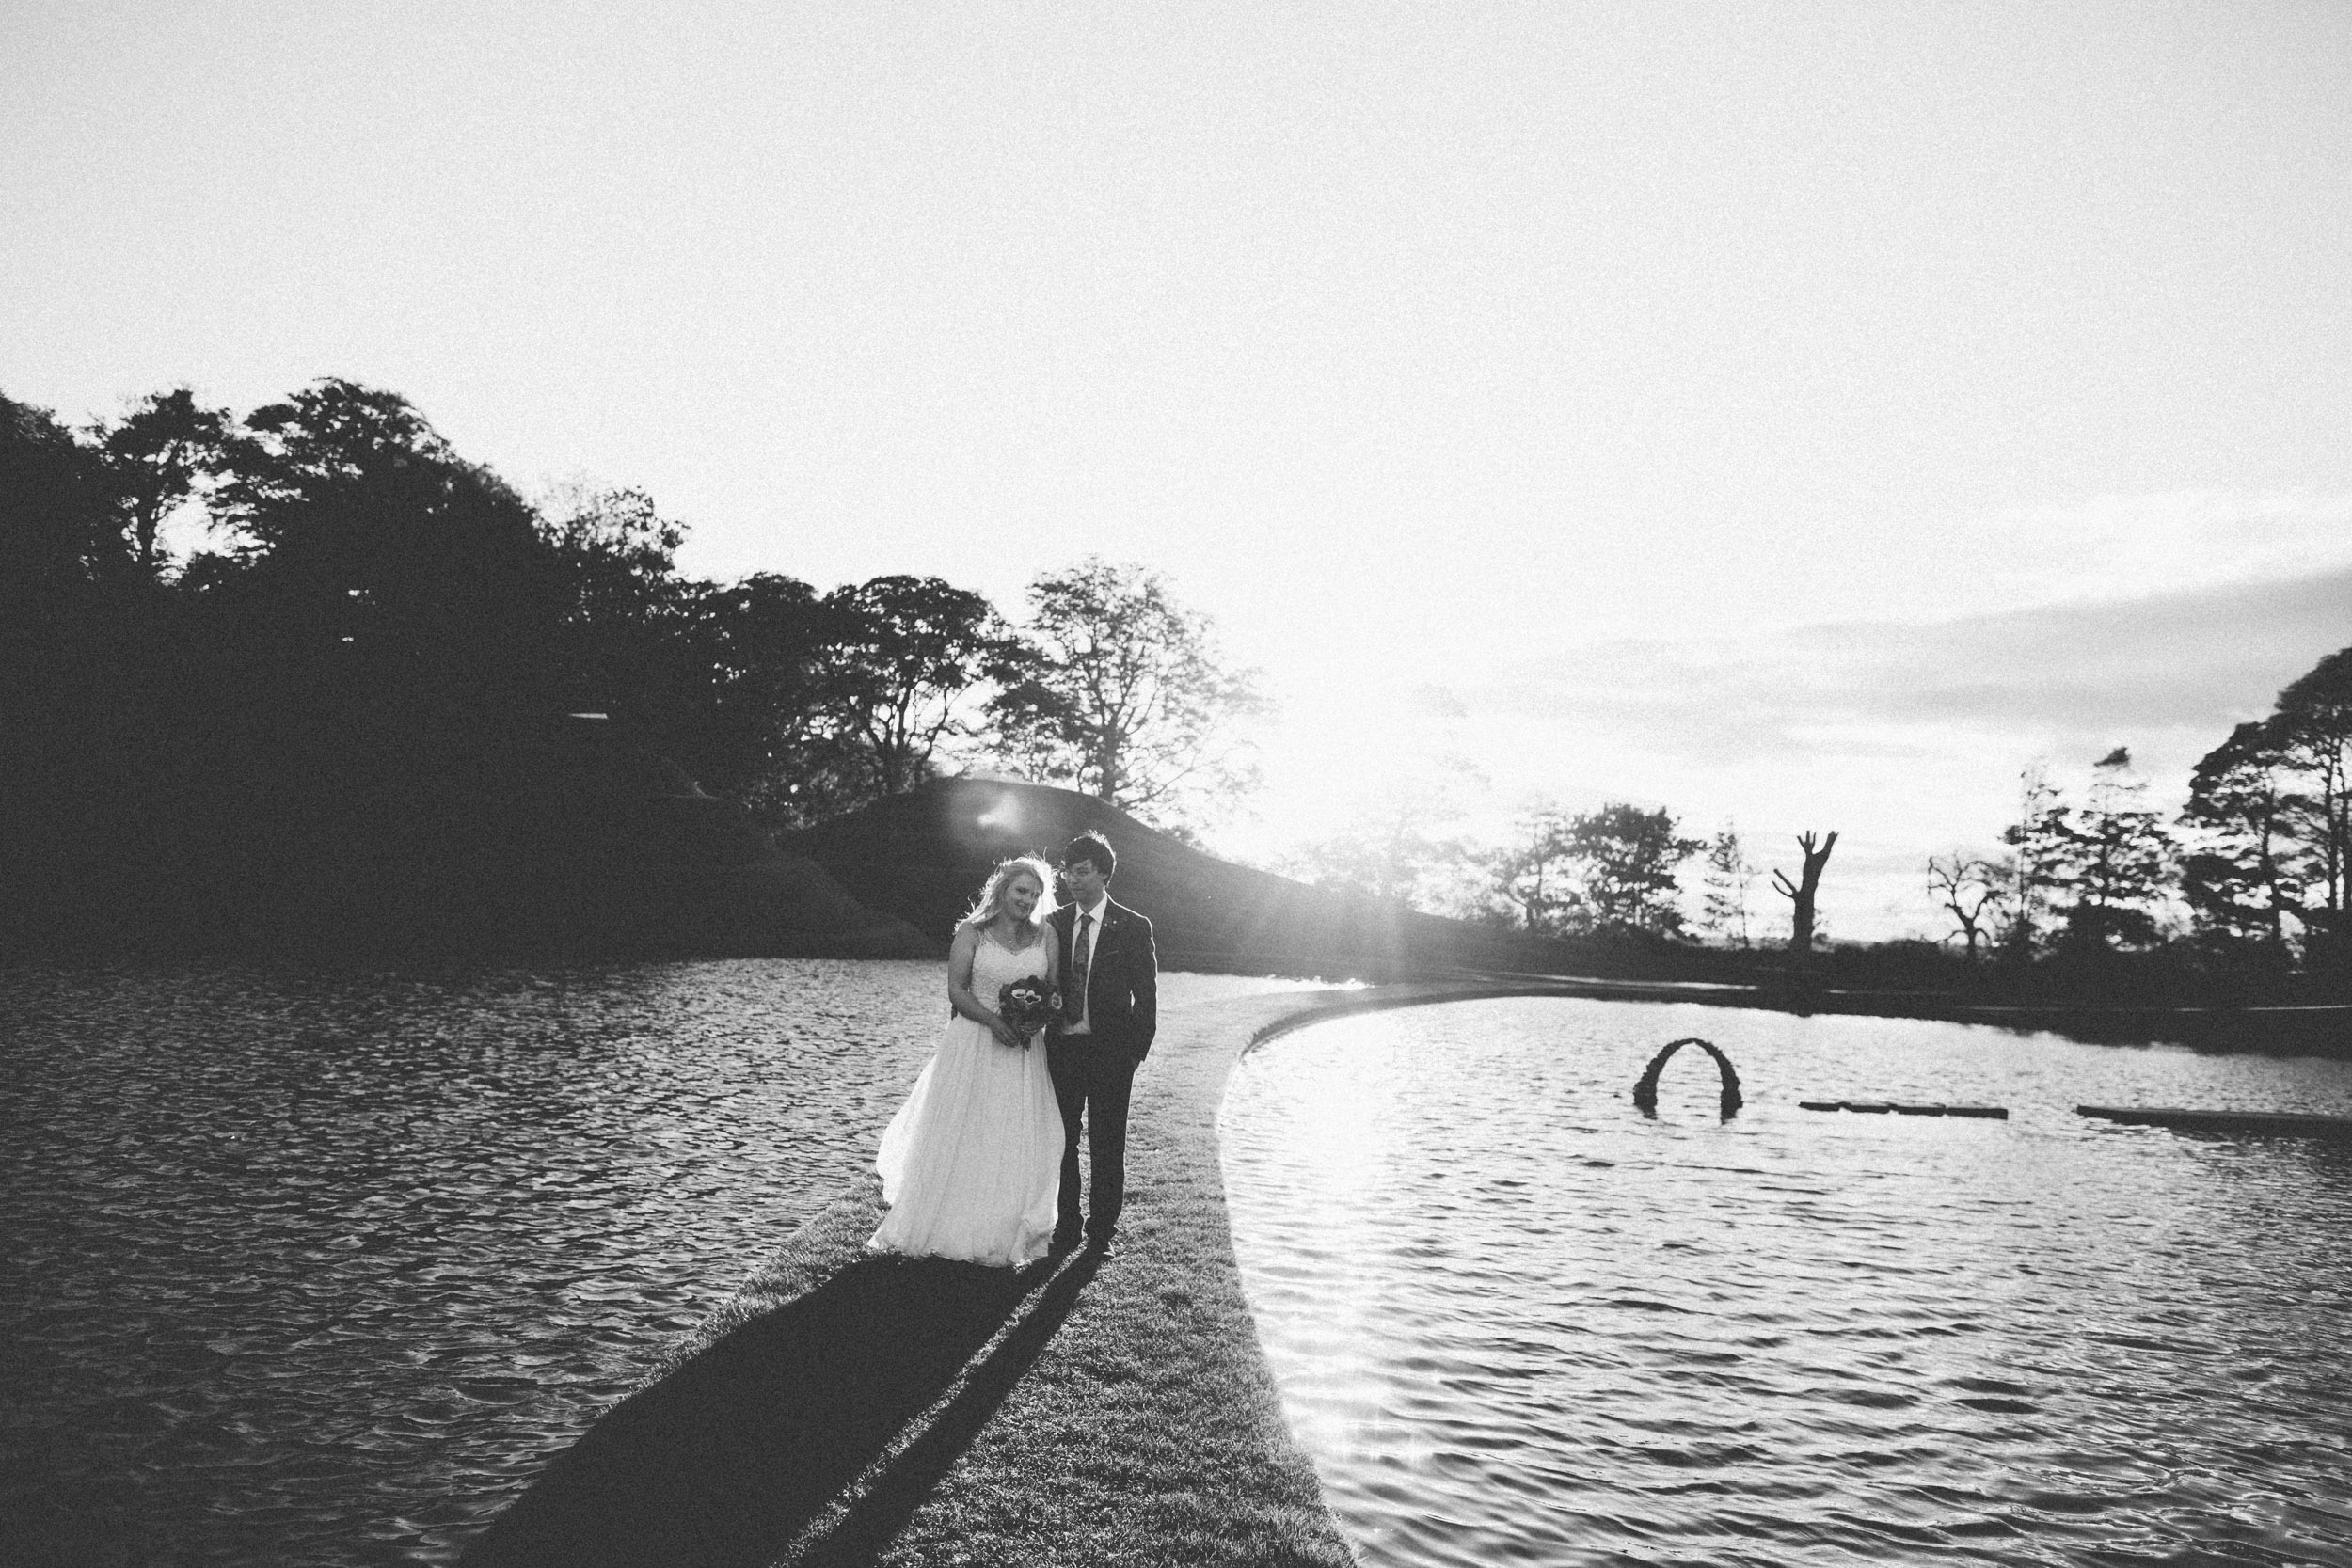 Quirky Wedding Photographer Edinburgh Jupiter Artland -61.jpg